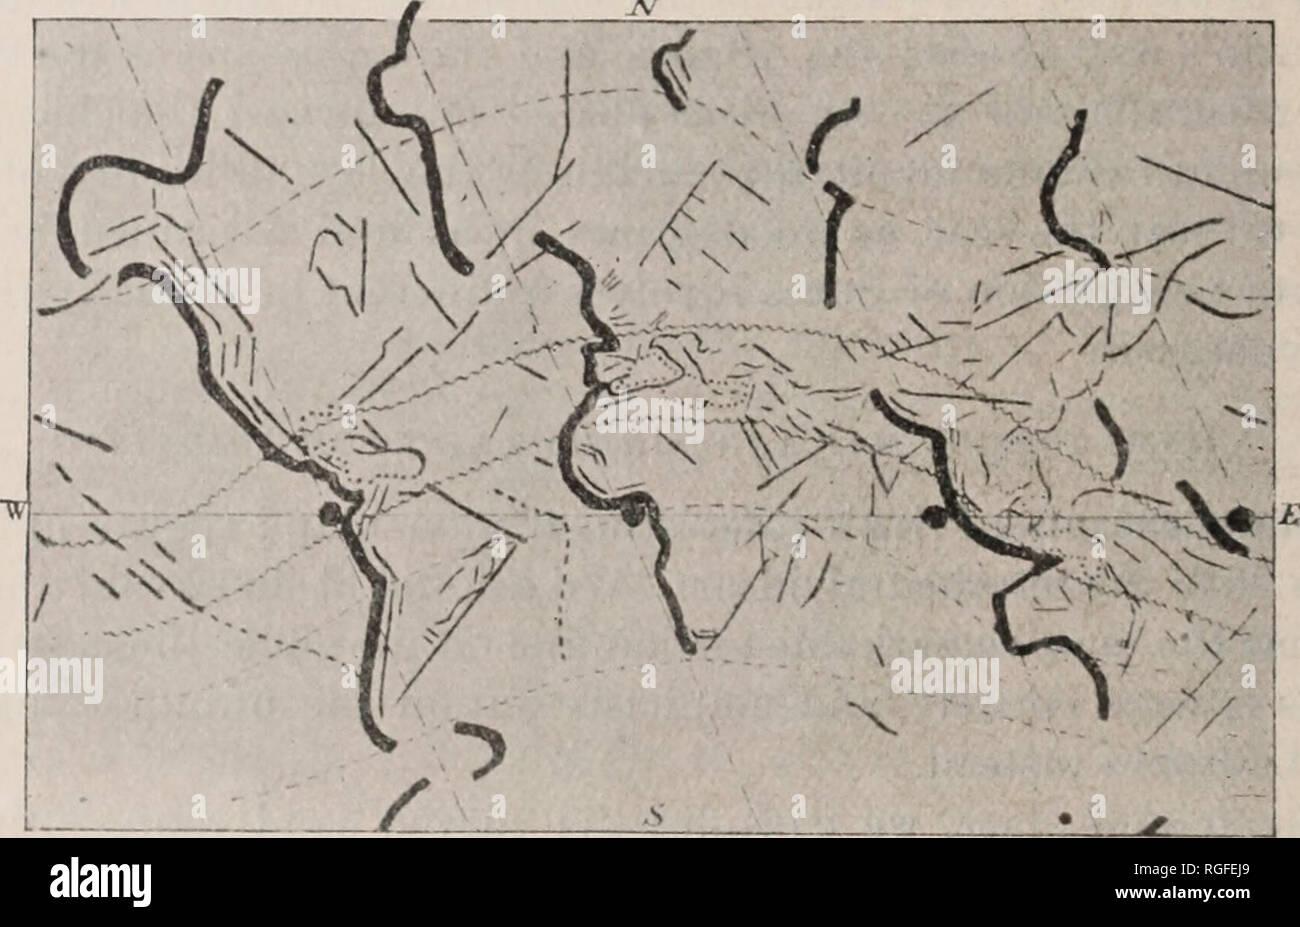 Bulletin of the Geological Society of America. Geology. 94 ... on globe of venus, solar system of venus, geography of venus, physical features of venus, lakes of venus, earth of venus, regions of venus, colors of venus, cities of venus, poles of venus, landmarks of venus, oceans of venus, stars of venus, map of venus, atmosphere of venus, weather of venus, clouds of venus,